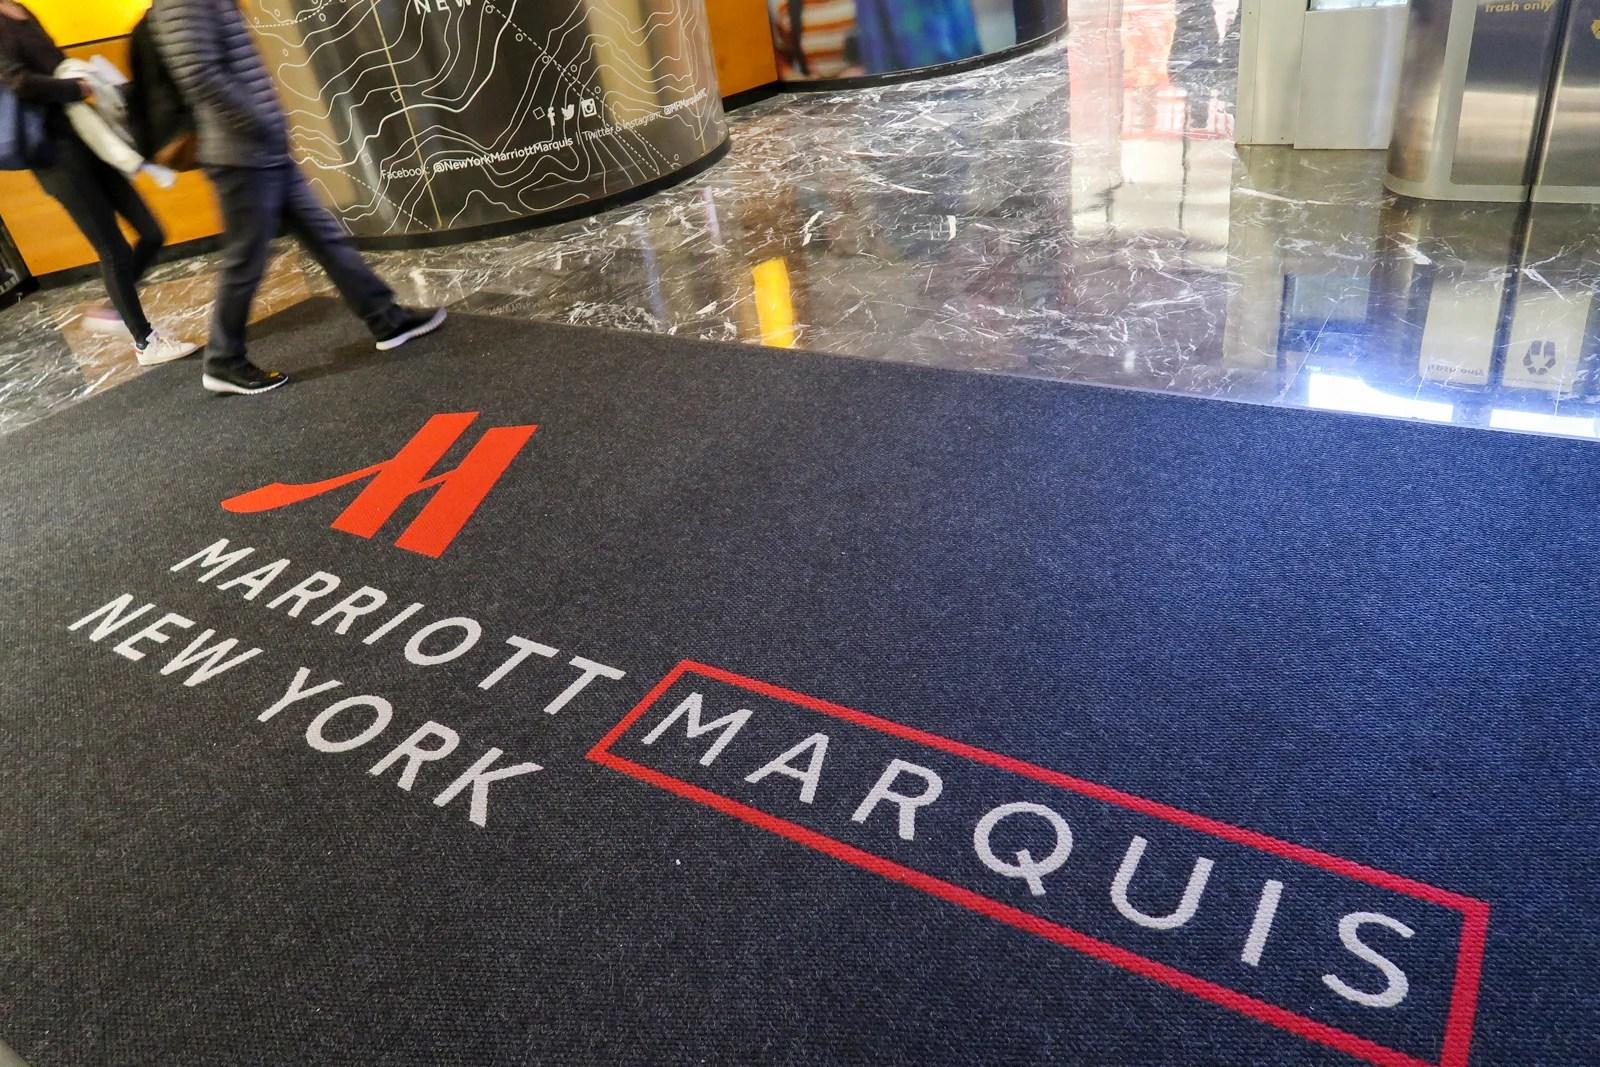 Marriott International will open at least 30 luxury properties in 2020